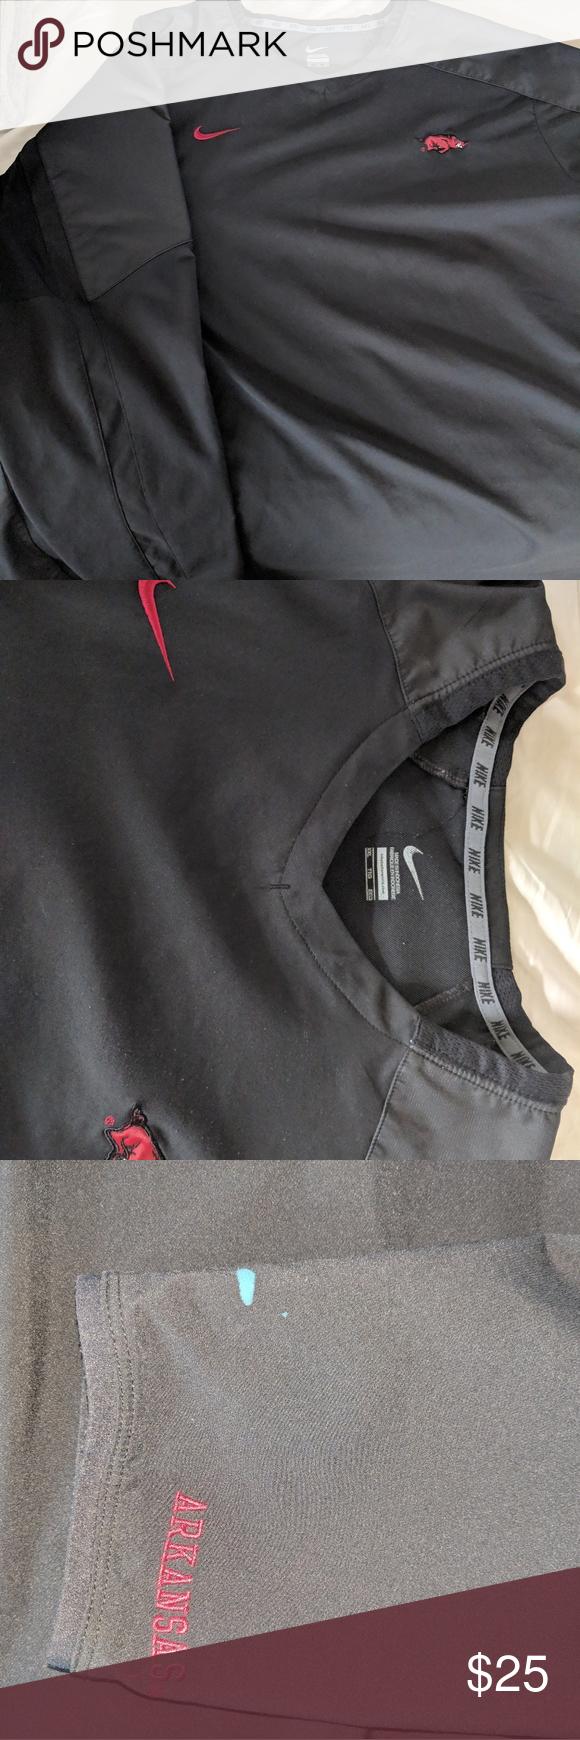 Nike Arkansas Razorback Pullover Nike Nike Shirts Sweatshirt Shirt [ 1740 x 580 Pixel ]